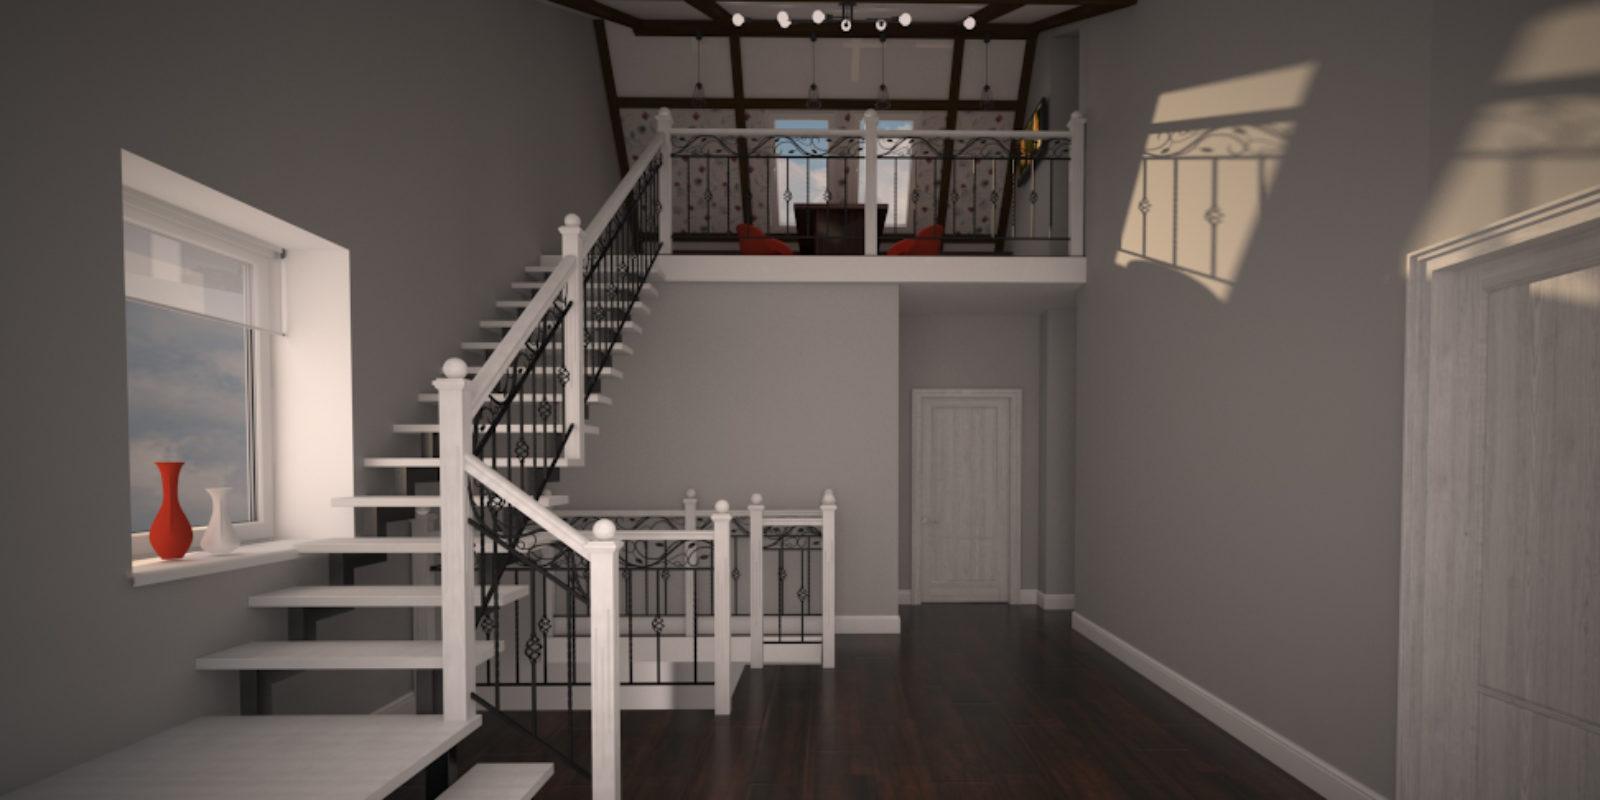 Дизайн проект двухуровневой квартиры. Холл.